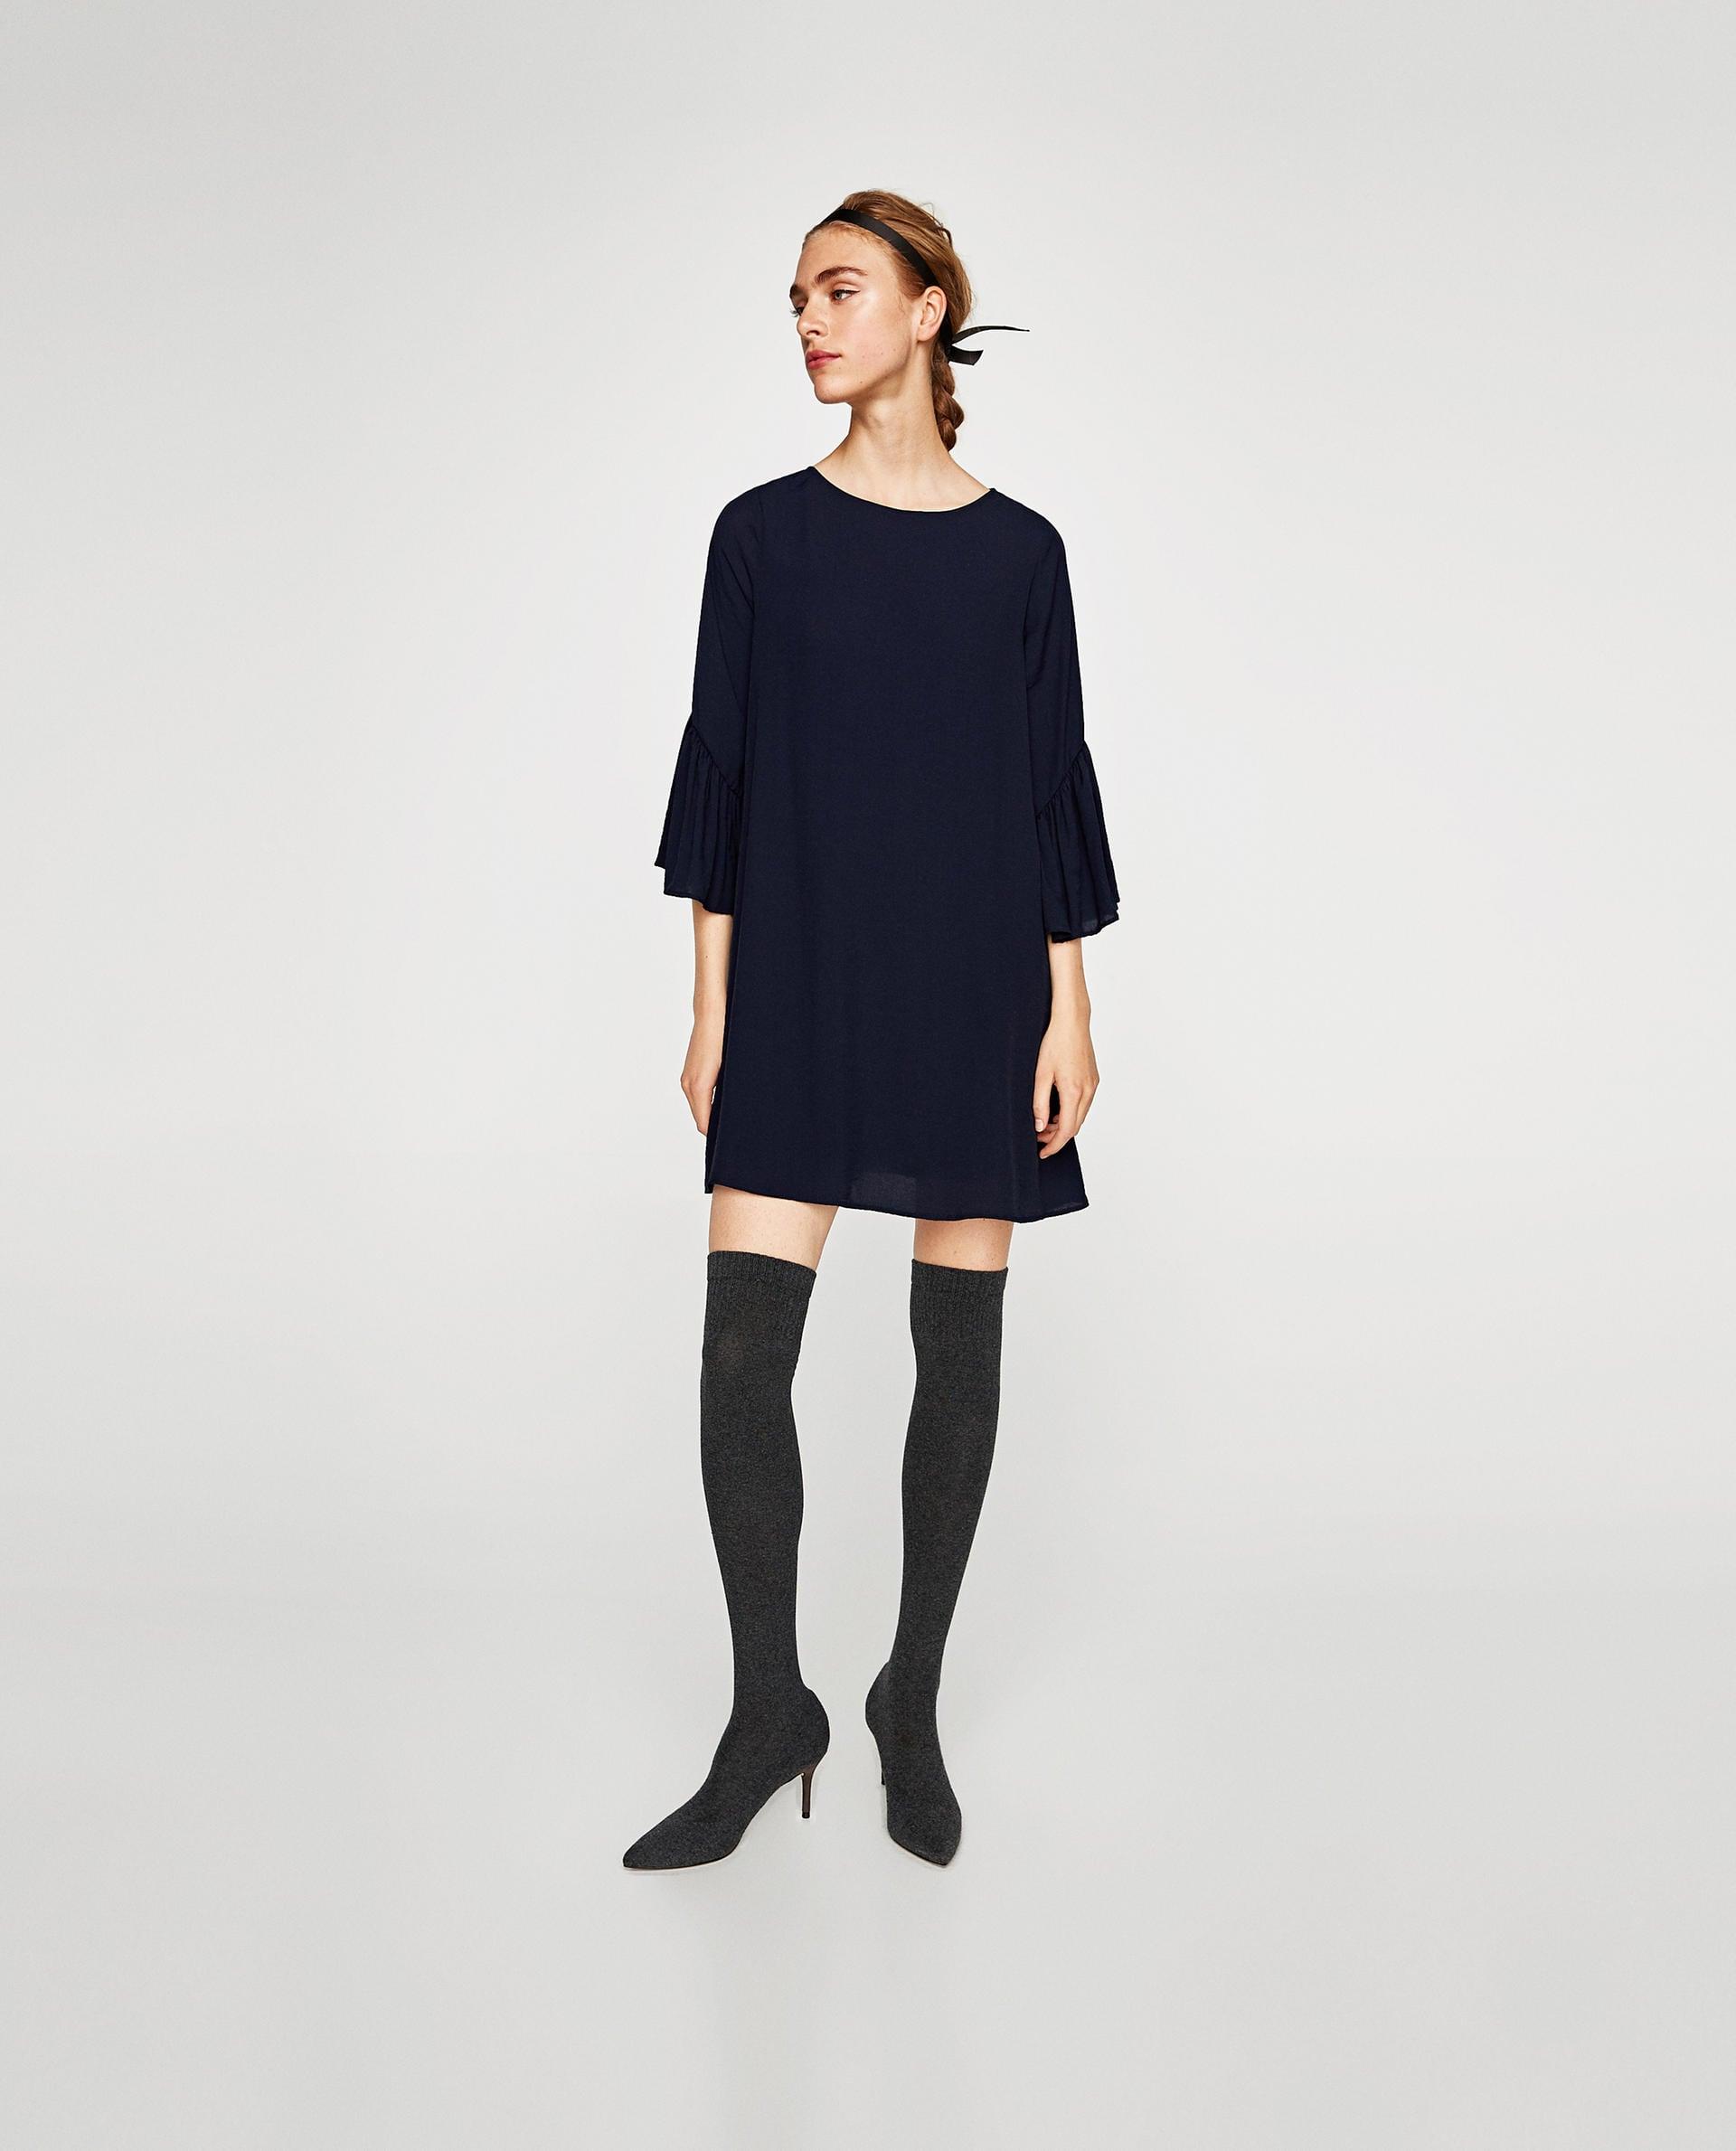 Stivali cuissard Zara al ginocchio saldi invernali 2018